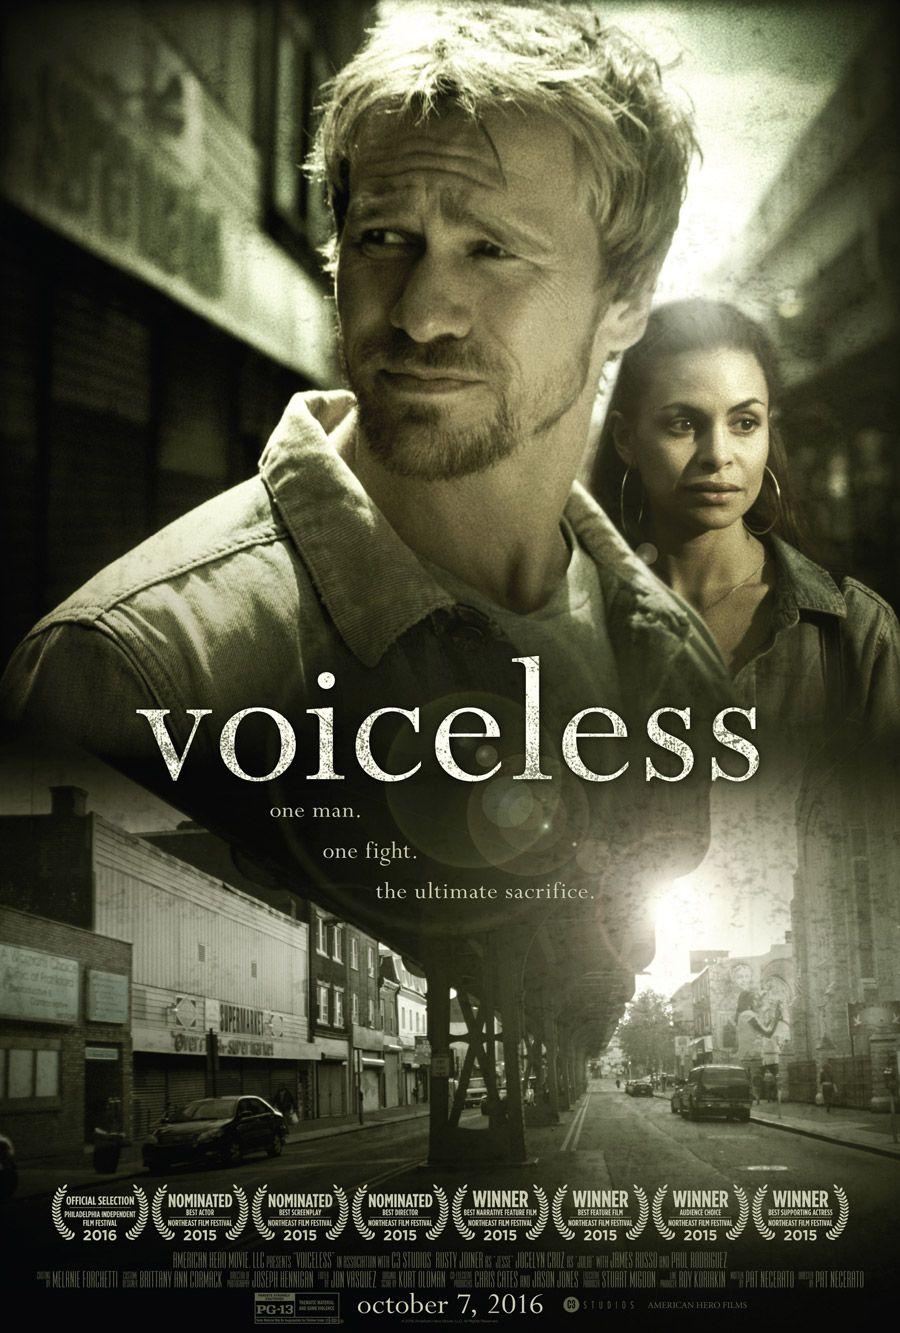 Voiceless | Movie Tickets & Showtimes | Regal Cinemas | movies ...